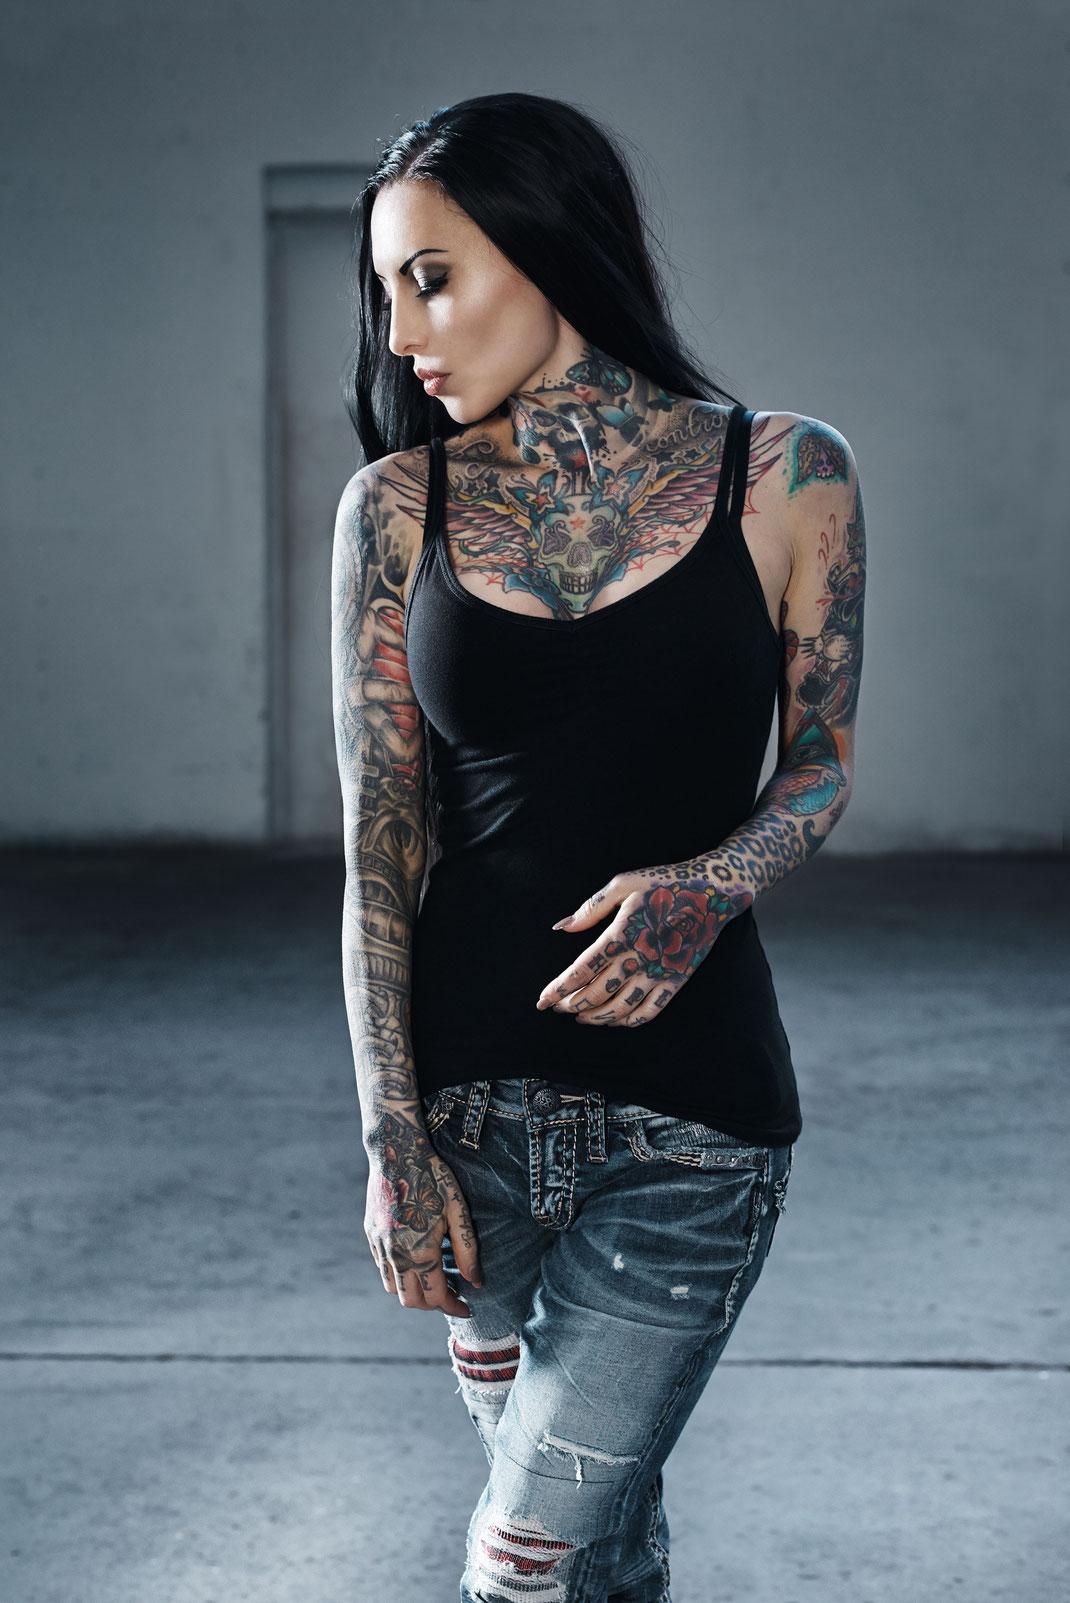 Portrait Tattoo Model Makani Terror by Martin Boelt Photography